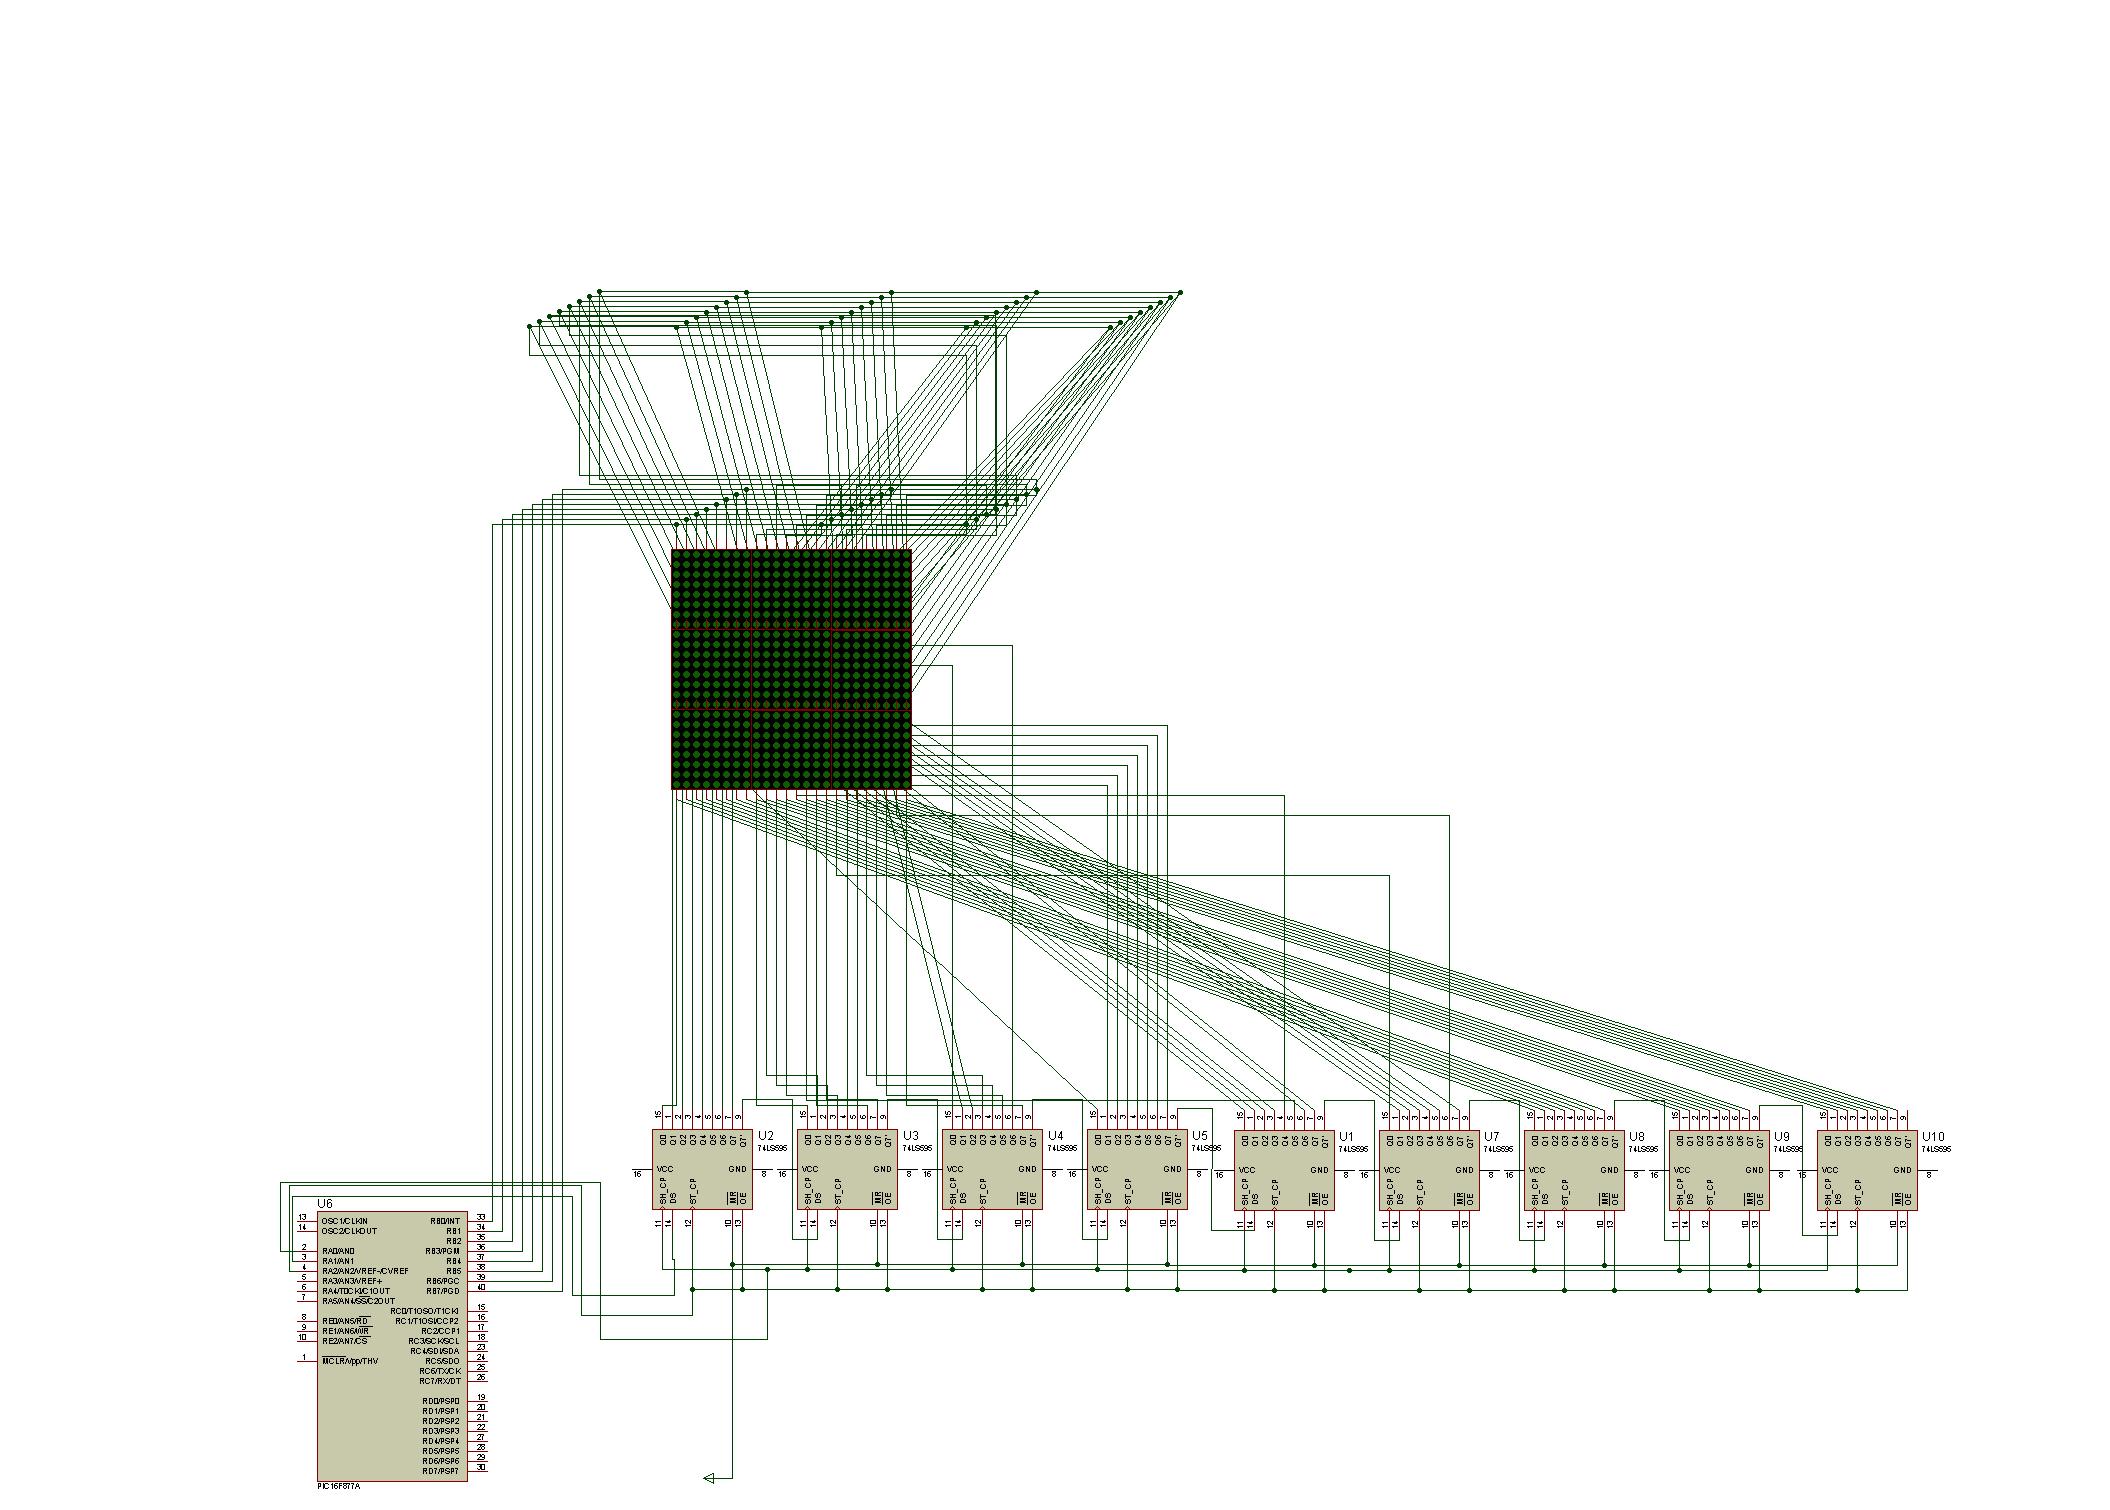 PIC16F877 16X16 LED Matrix 74HC595 Graphic Display Project